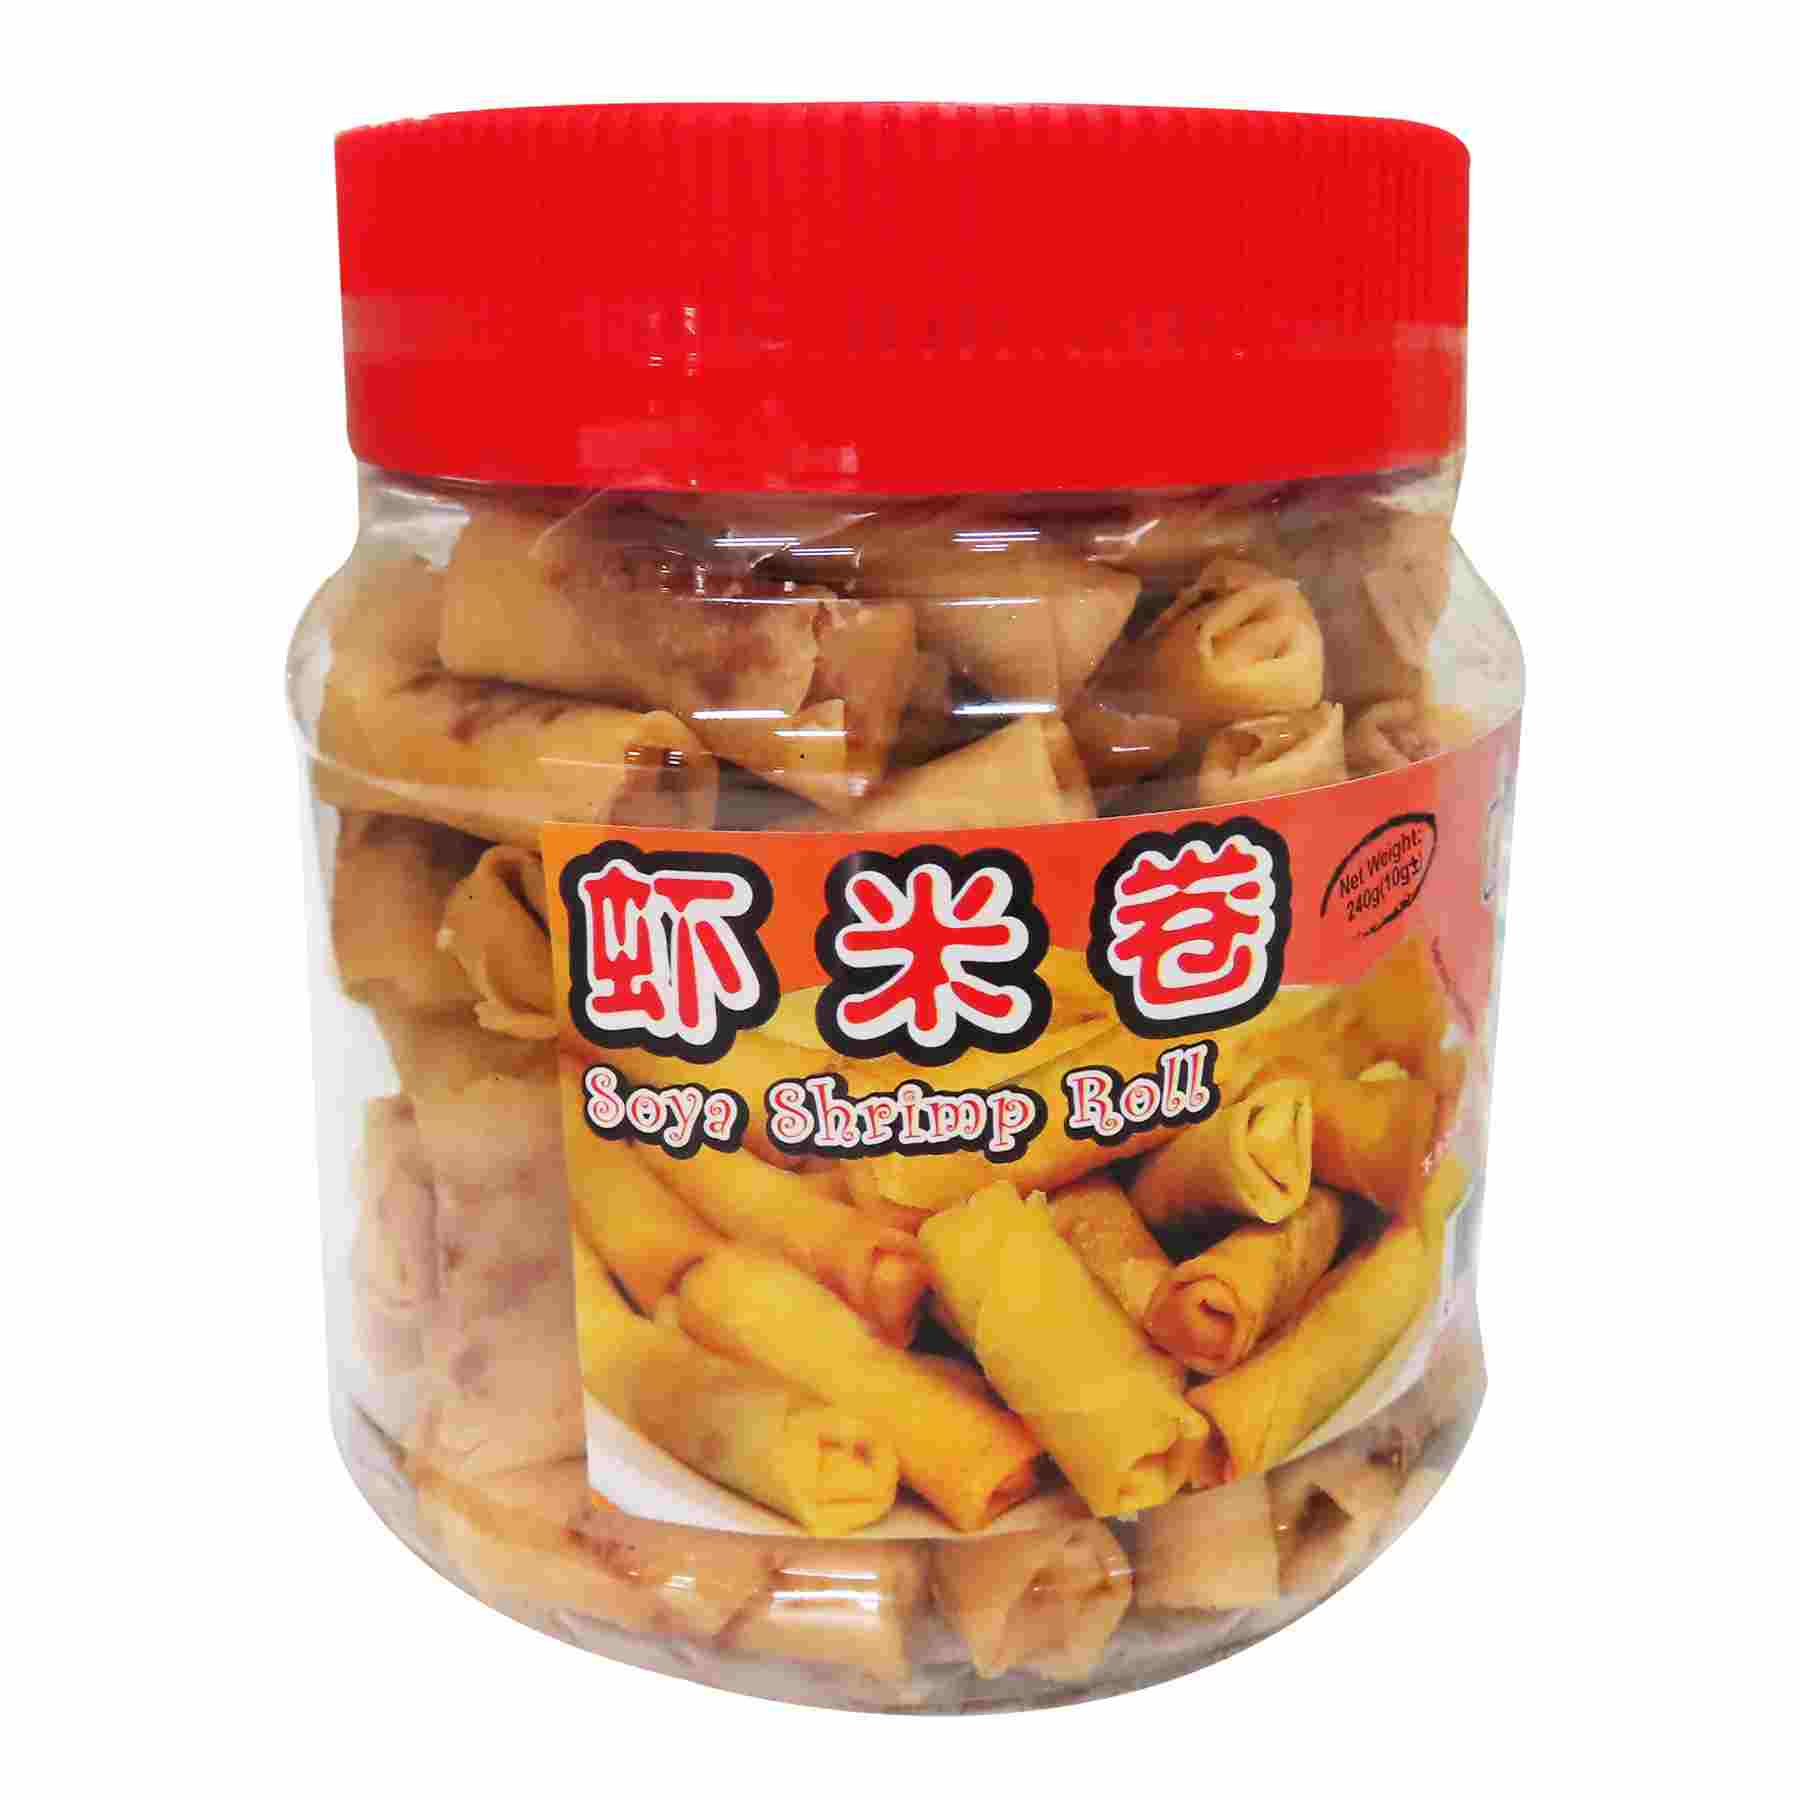 Image Soya Shrimp Roll Hae Bee Hiam Roll 德胜 - 虾米卷 250grams